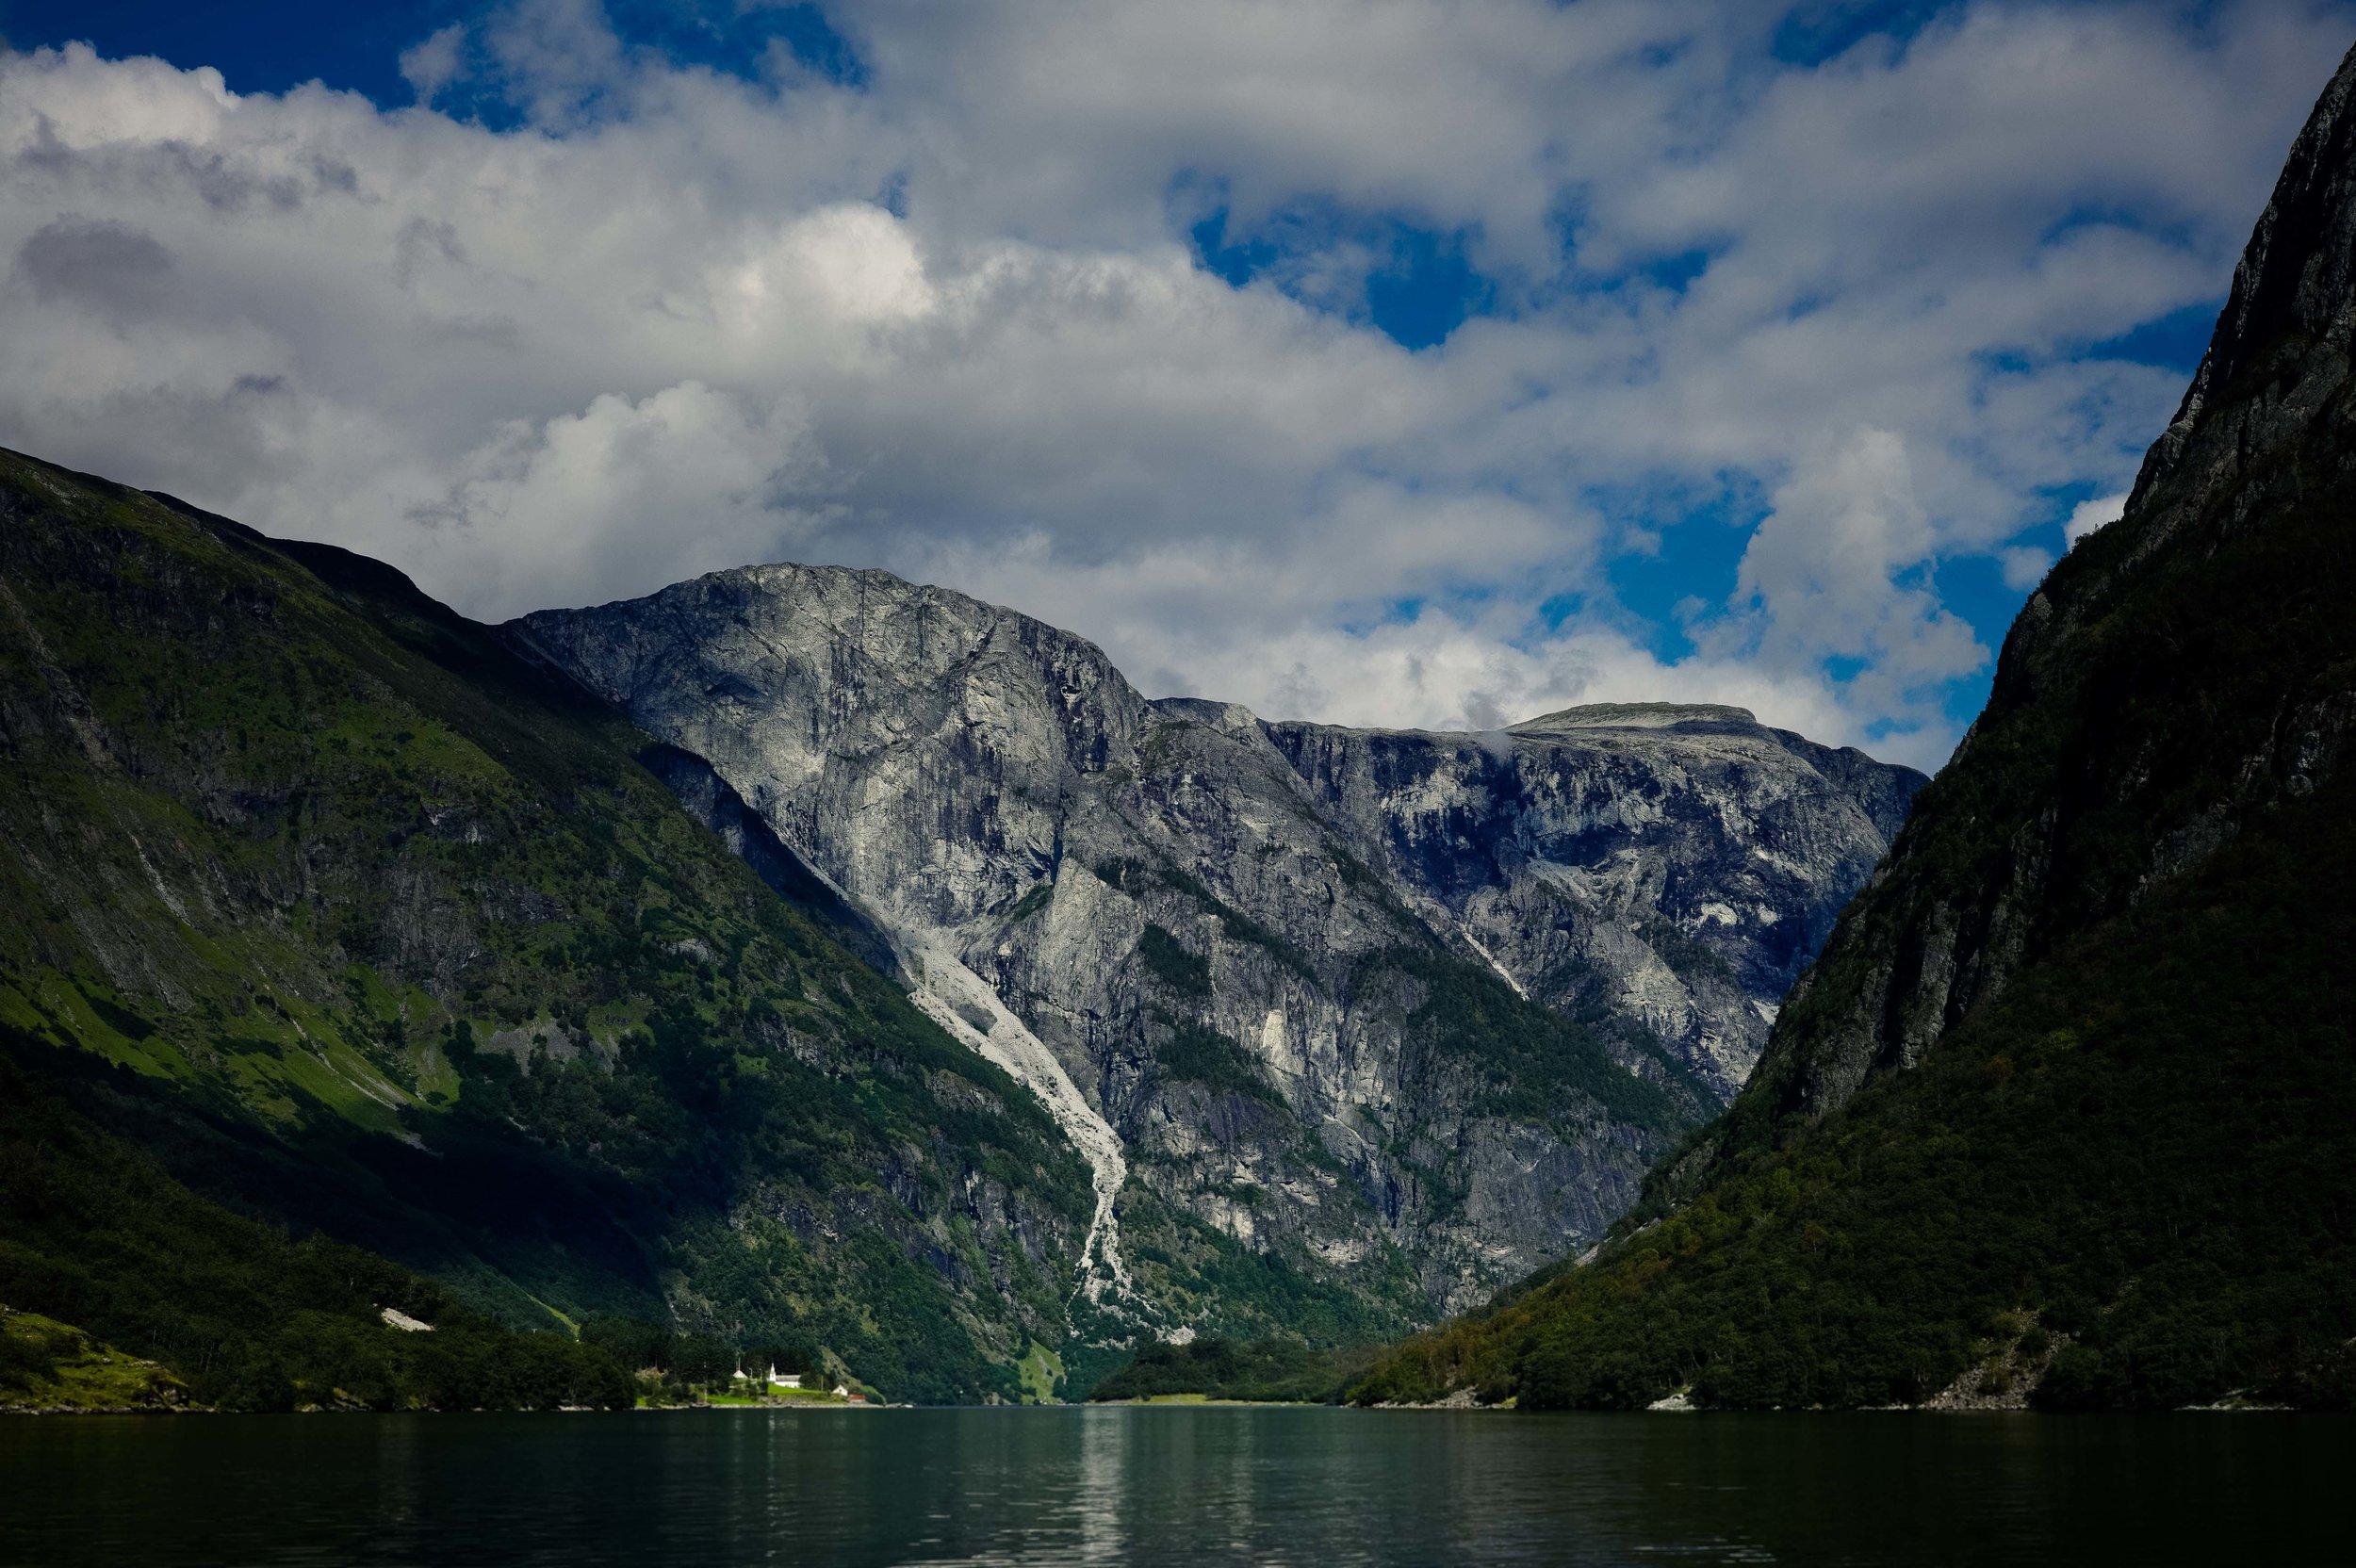 Aurlandsfjorden,Norway. Photo: Daniel Novello